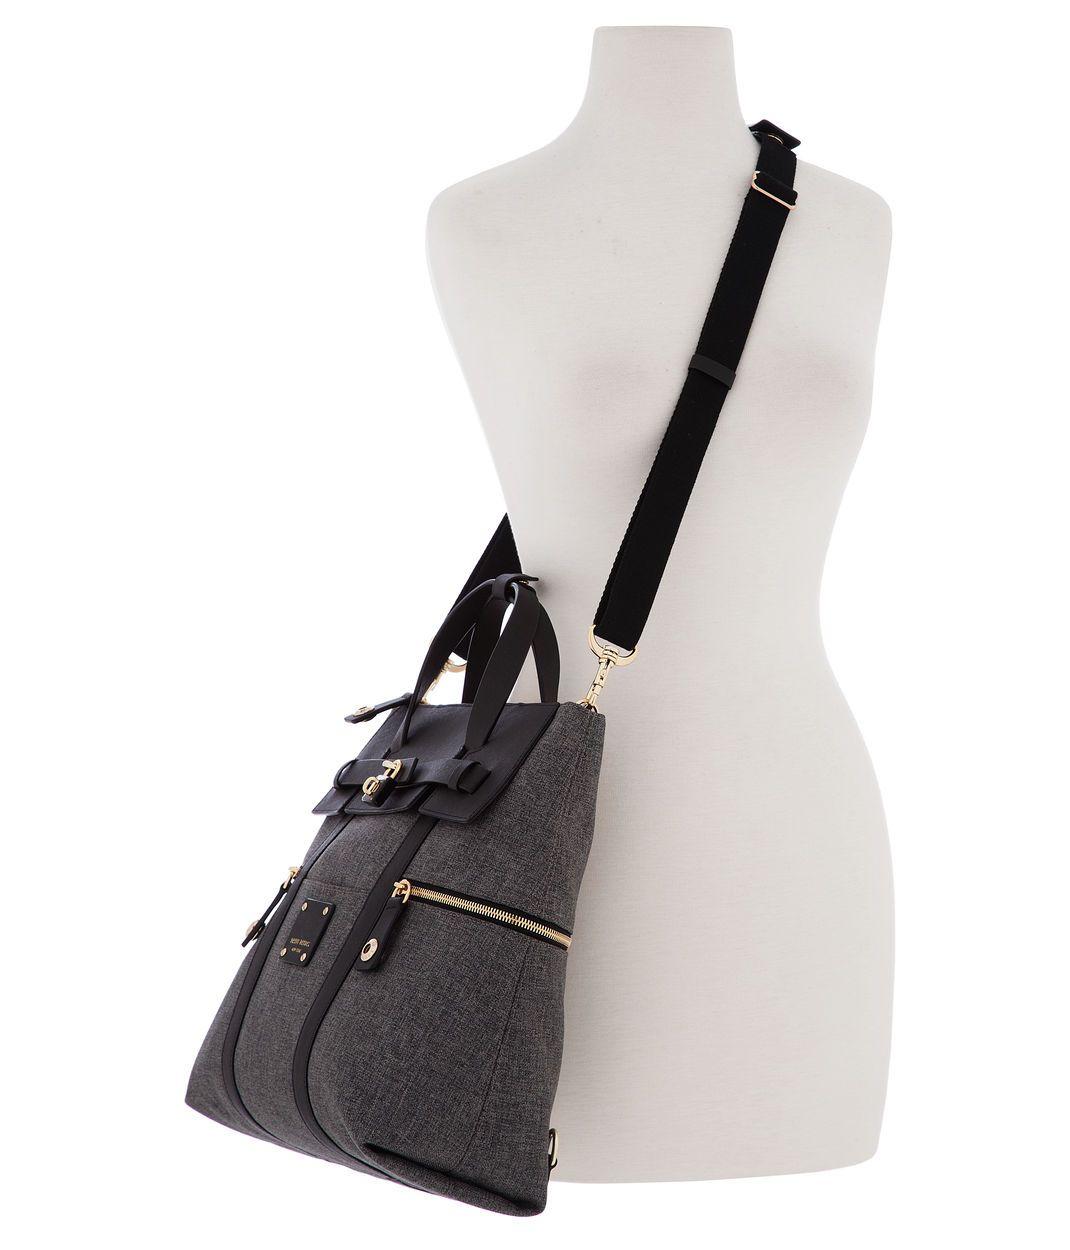 Jetsetter Black Canvas Convertible Backpack | Henri Bendel